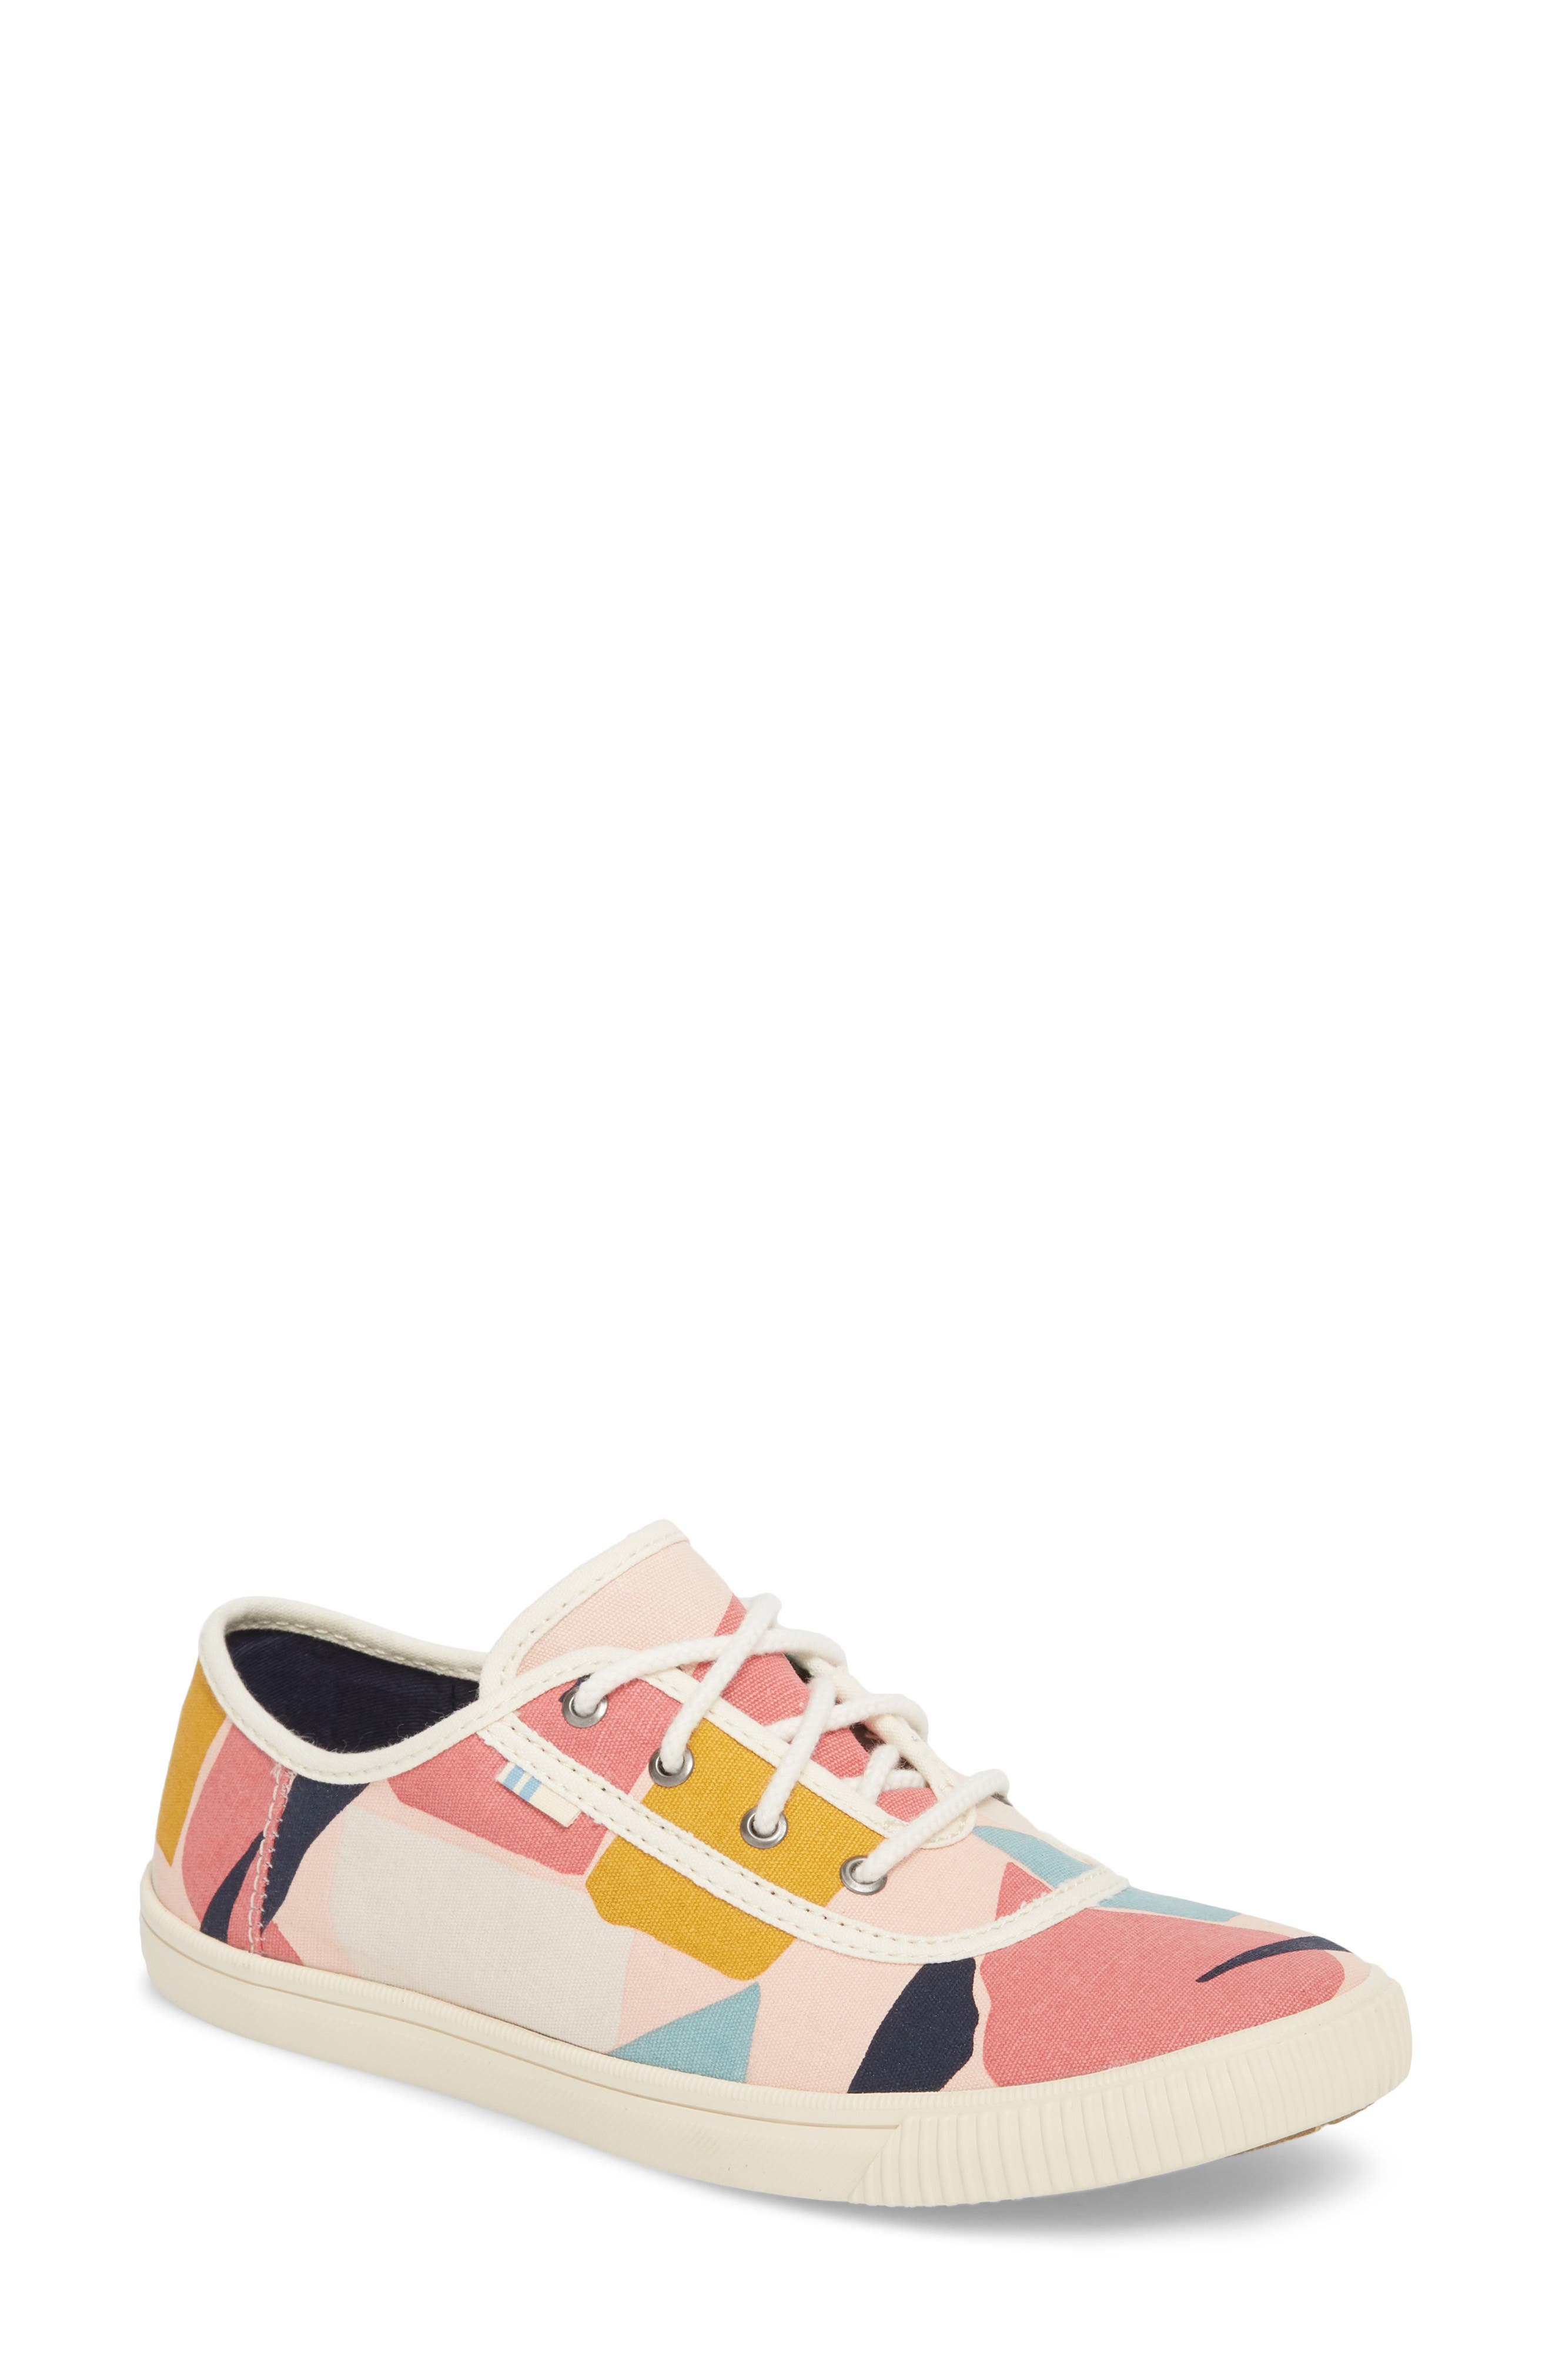 Carmel Print Sneaker,                         Main,                         color,